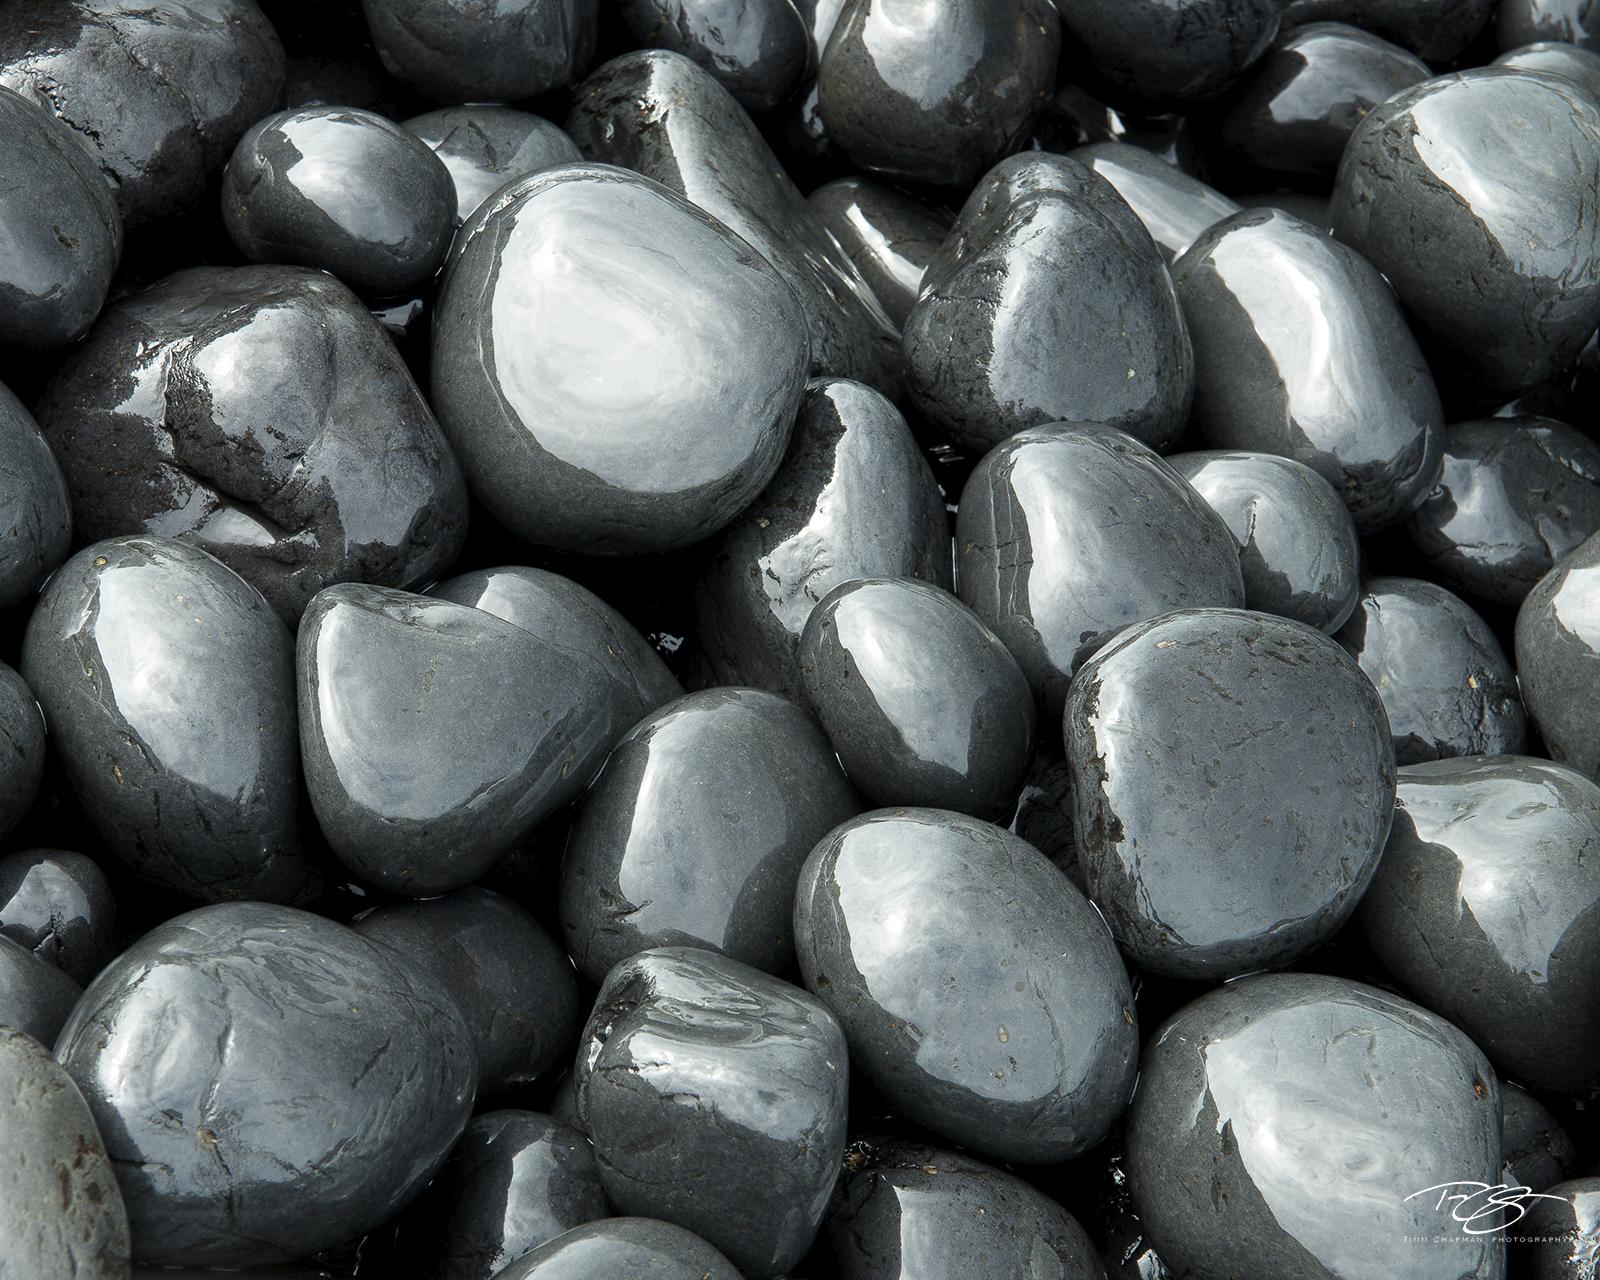 cobbles, cobblestones, black round stones, gun metal stones, gun metal rocks, oregon coast, newport, yaquina head lighthouse, cobble beach, Cobbles, round polished rocks, polished basalt, photo